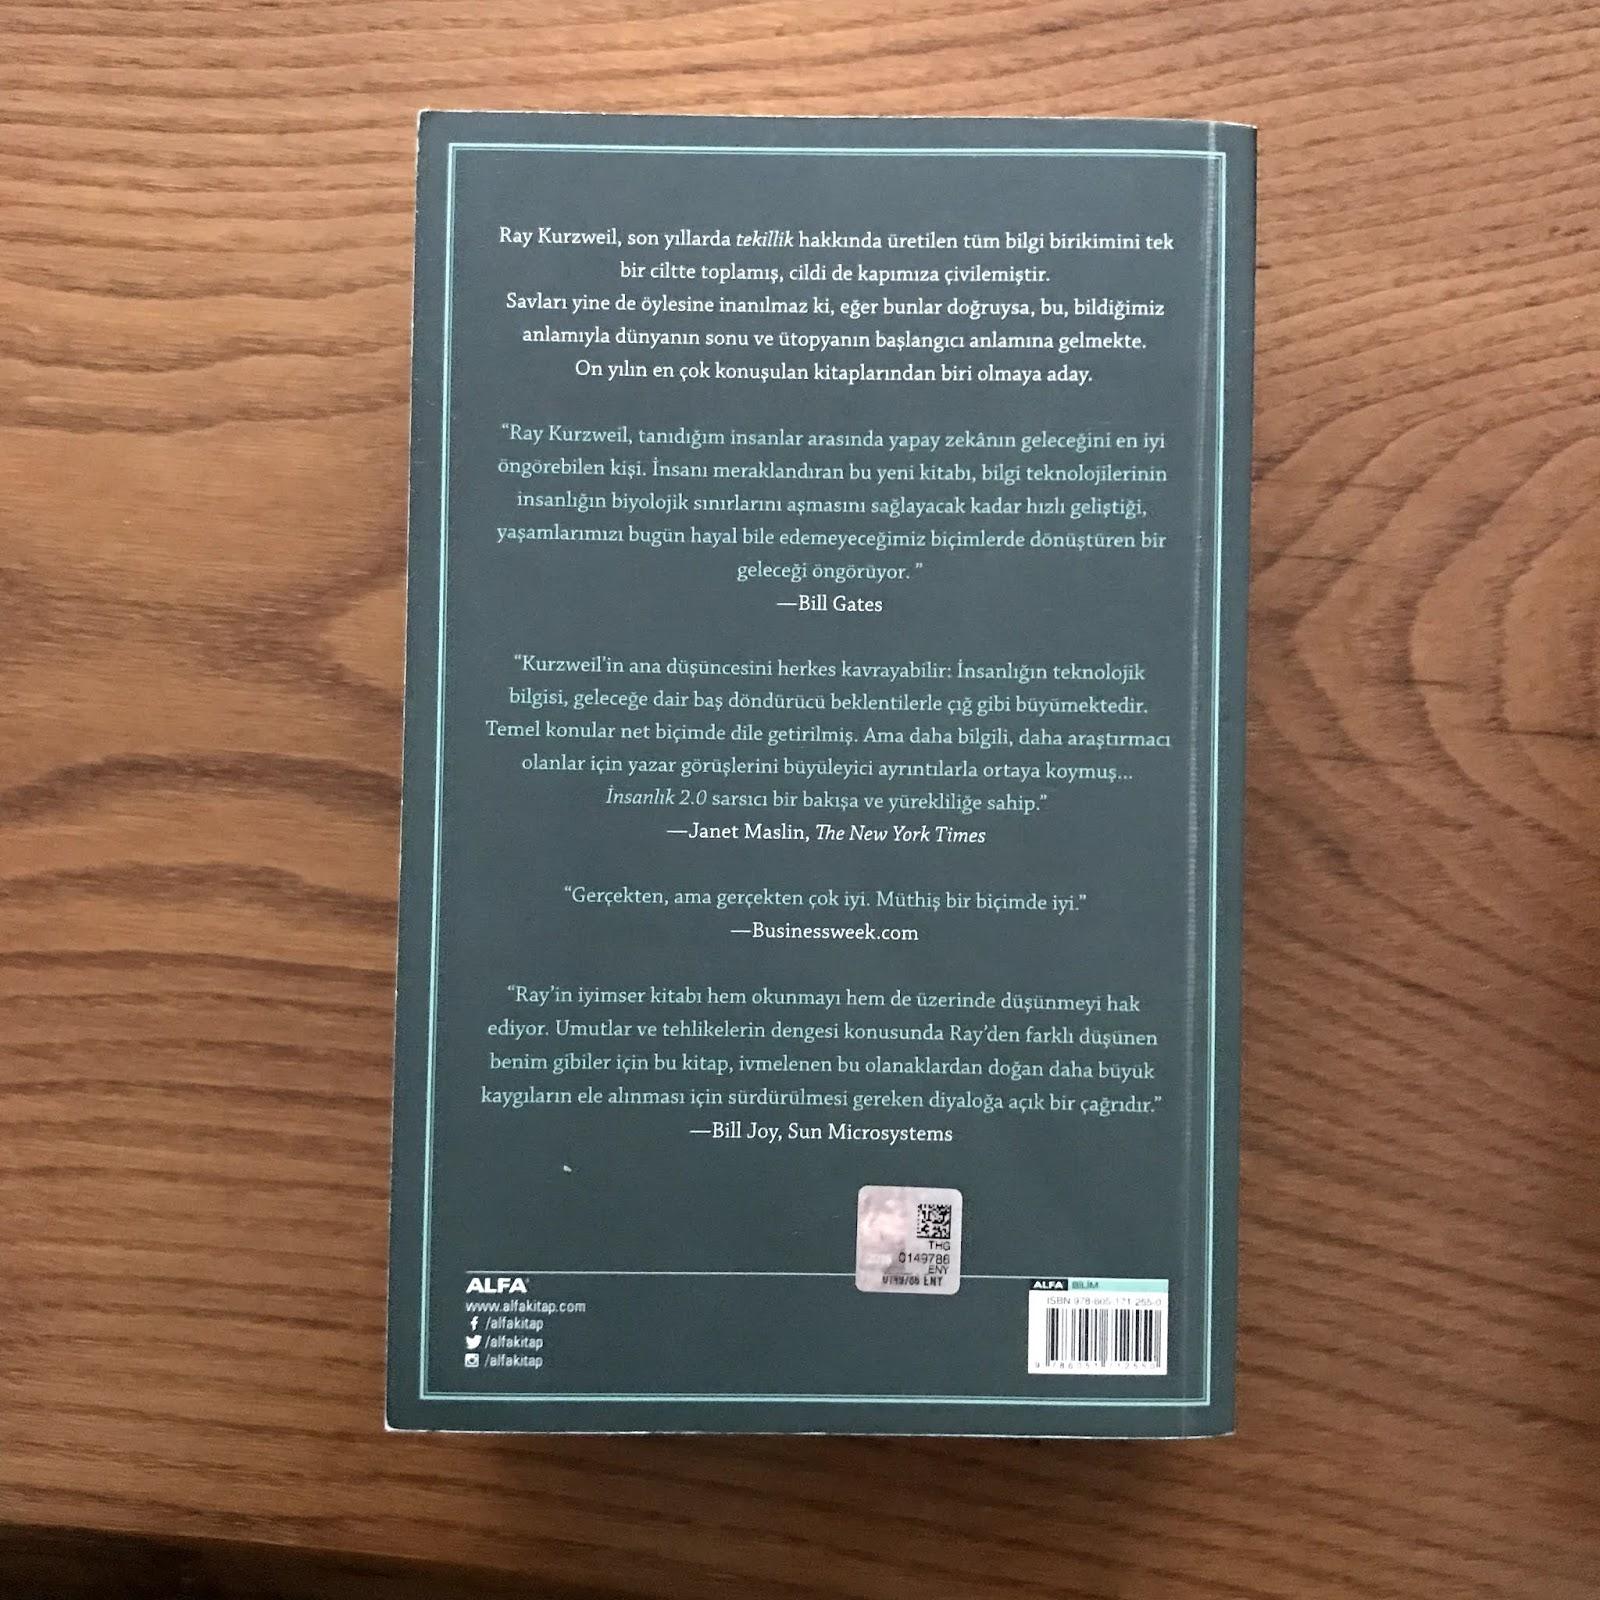 Insanlik 2.0 - Tekillige Dogru Biyolojisini Asan Insan (Kitap)